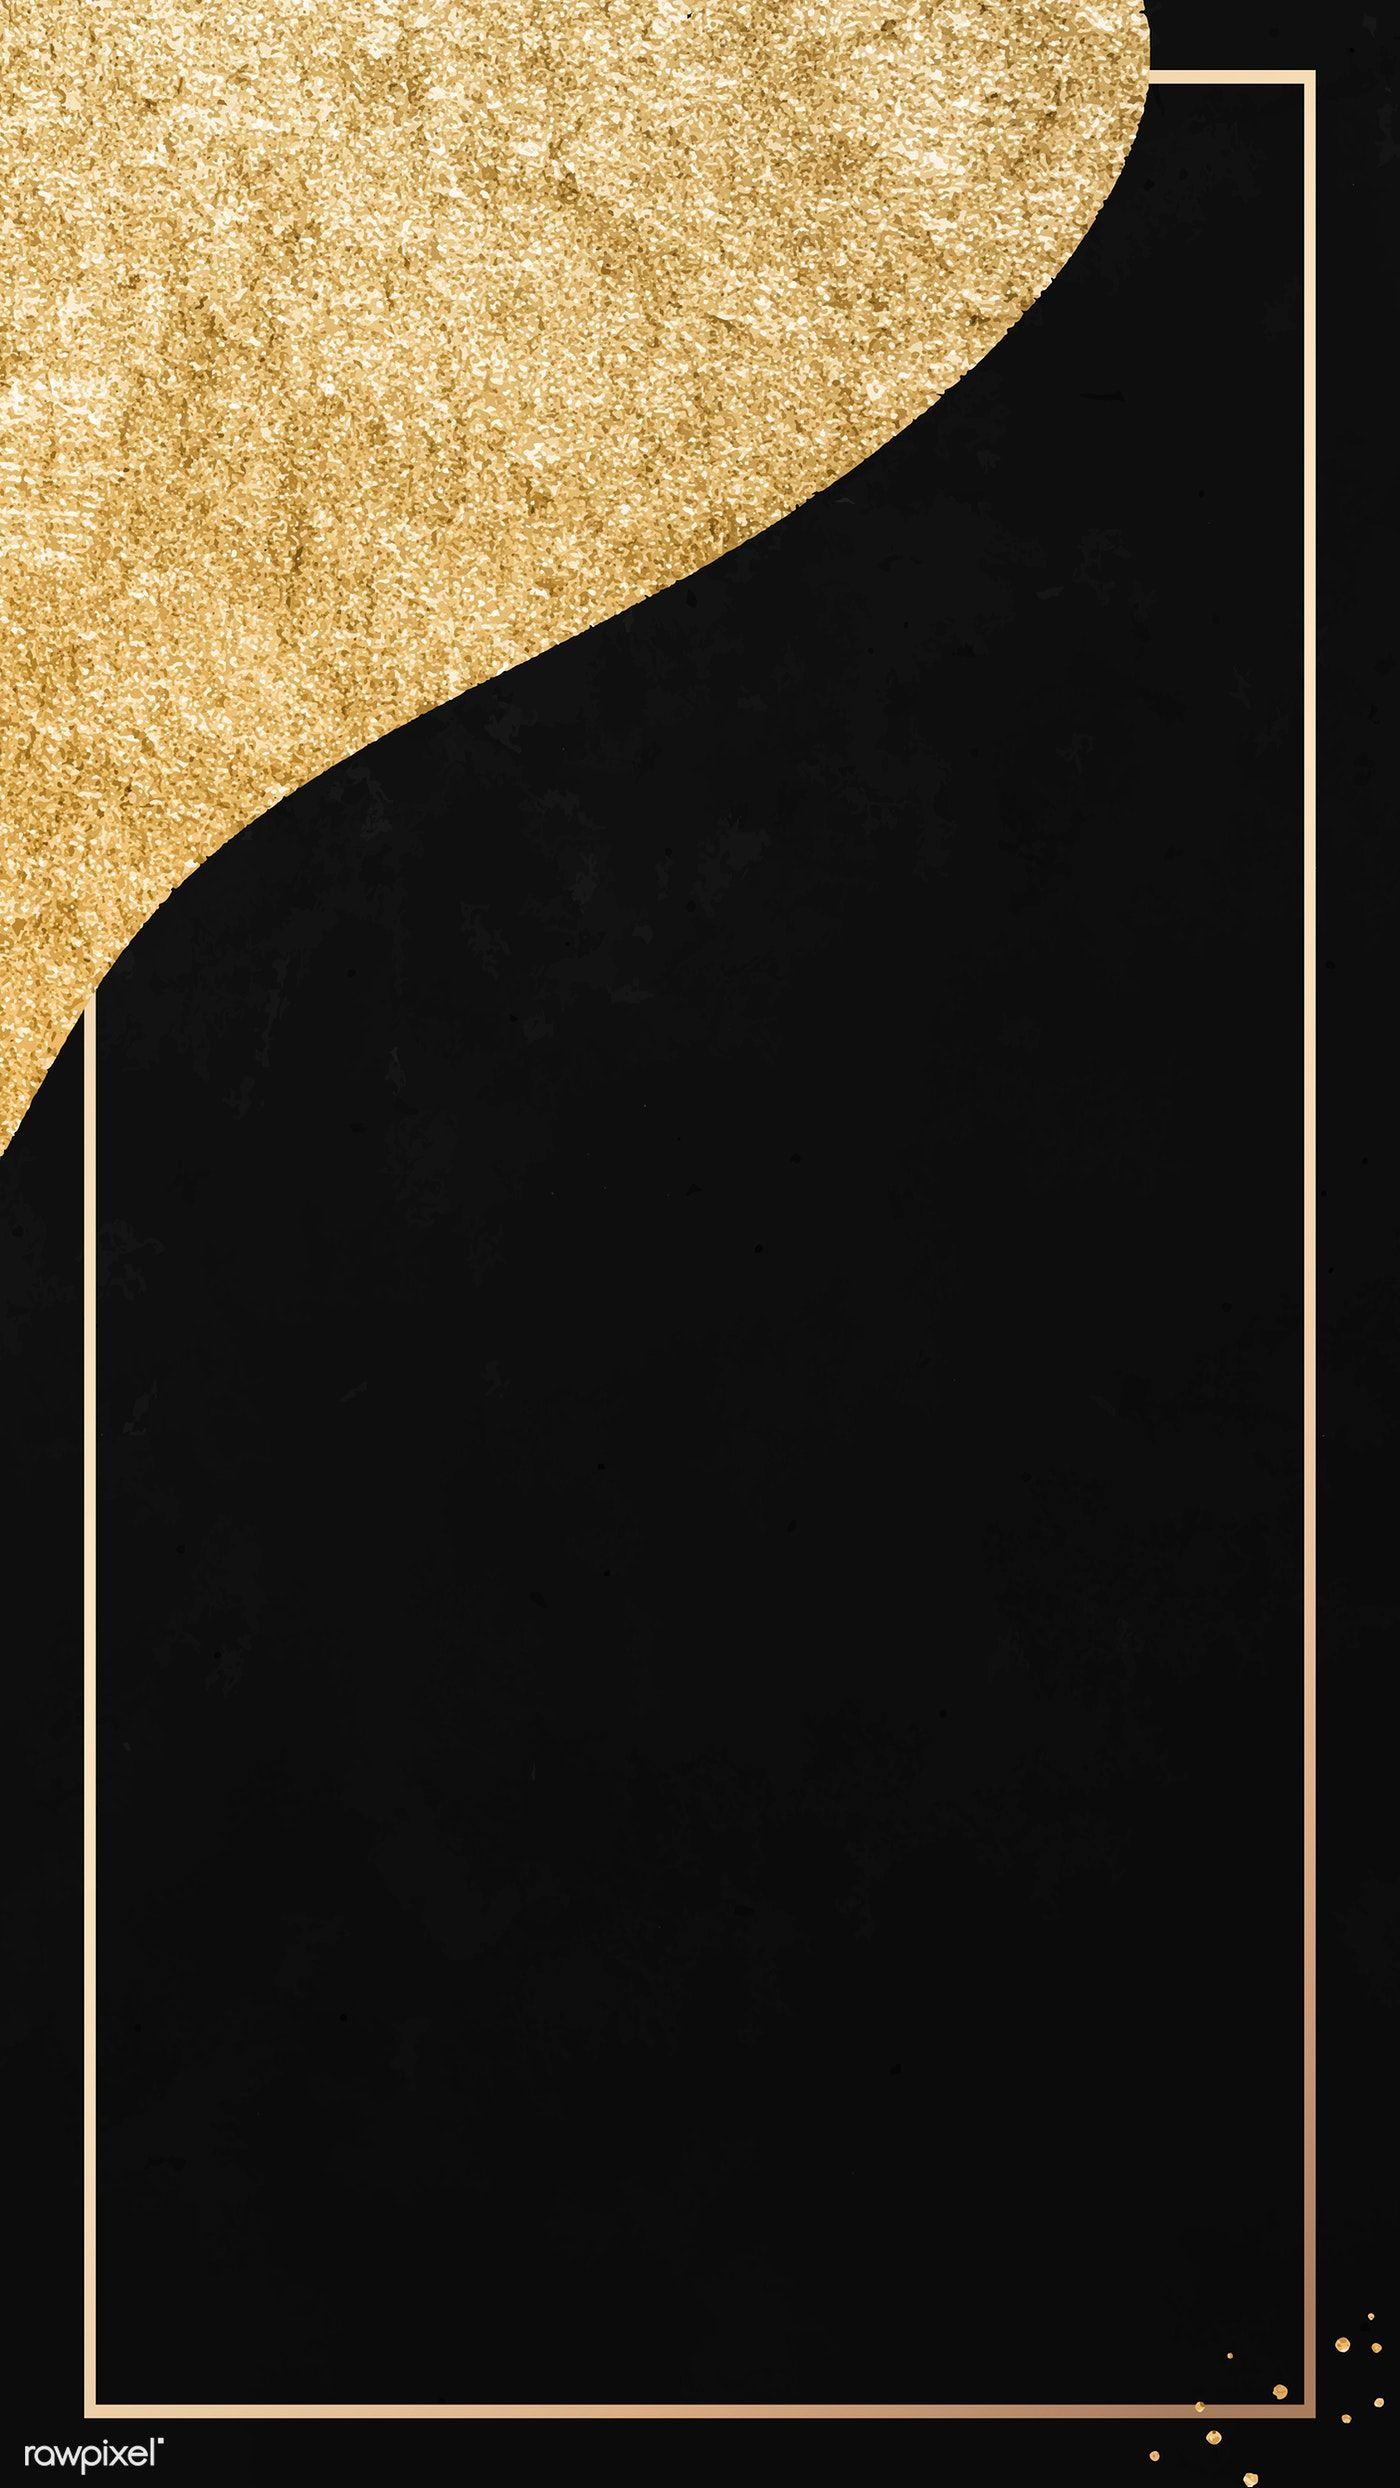 Download Premium Vector Of Gold Frame On Black And Golden Patterned Mobile Gold And Black Wallpaper Golden Pattern Gold Wallpaper Phone